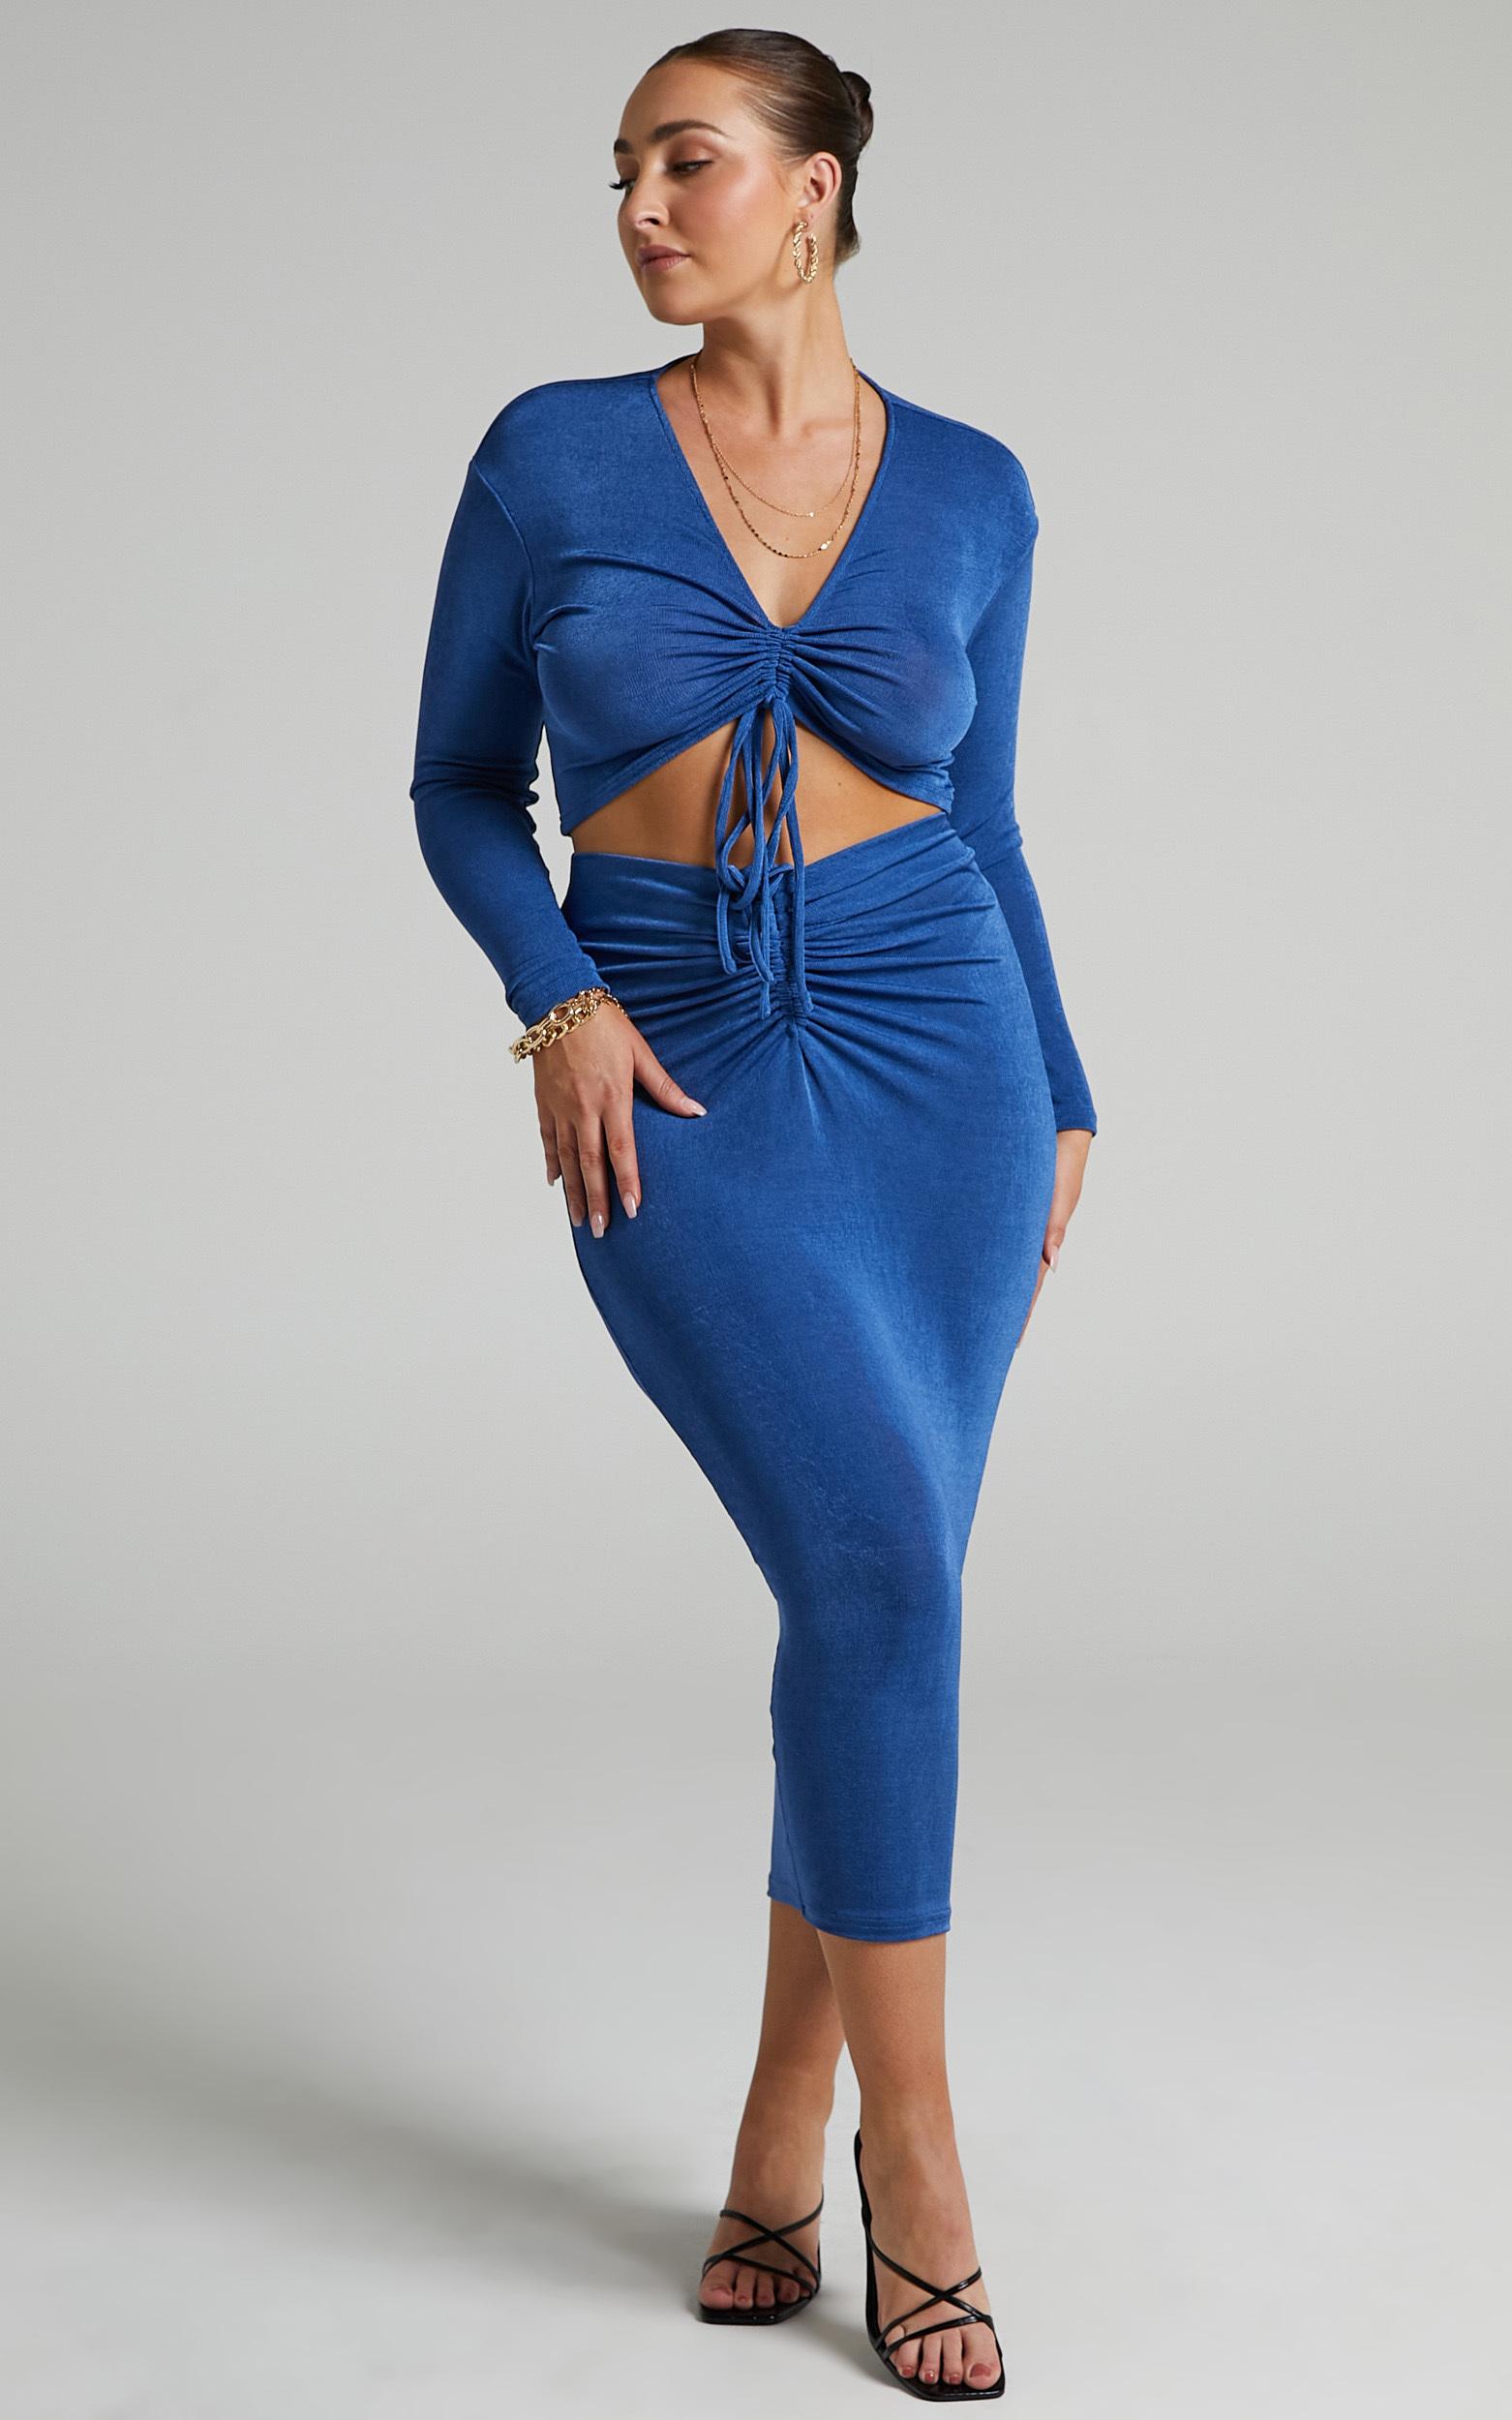 Luciana Rouched V Waist Skirt in Cobalt - 06, BLU1, hi-res image number null